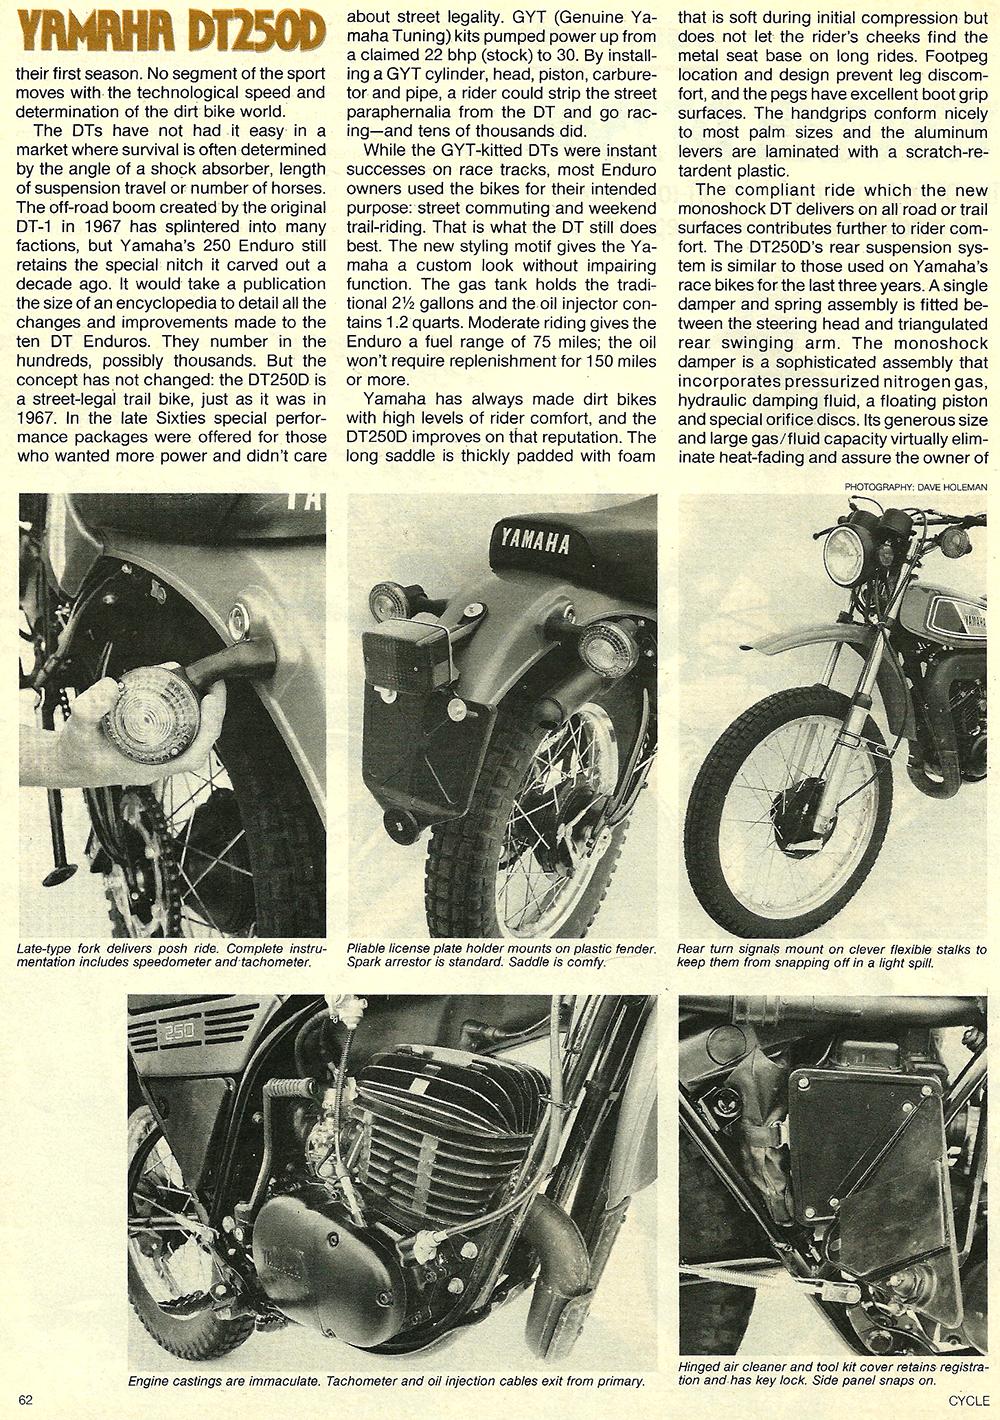 1977 Yamaha DT250D road test 2.jpg